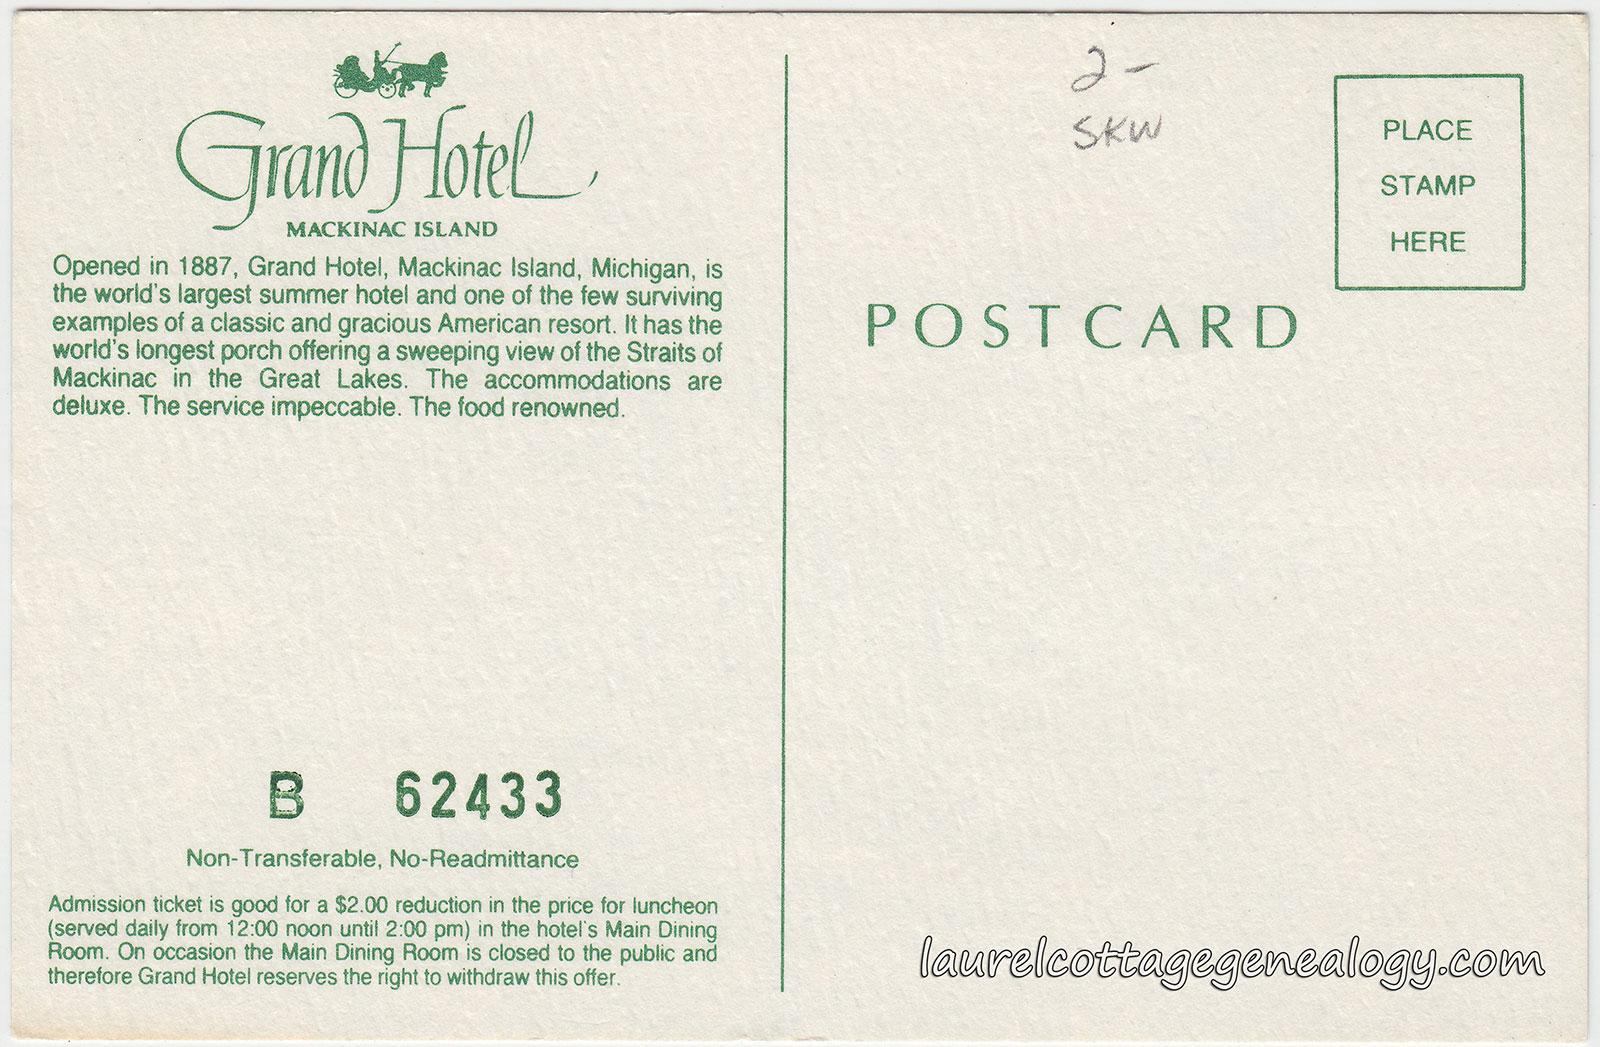 Grand Hotel Mackinac Island Michigan Laurel Cottage Genealogy